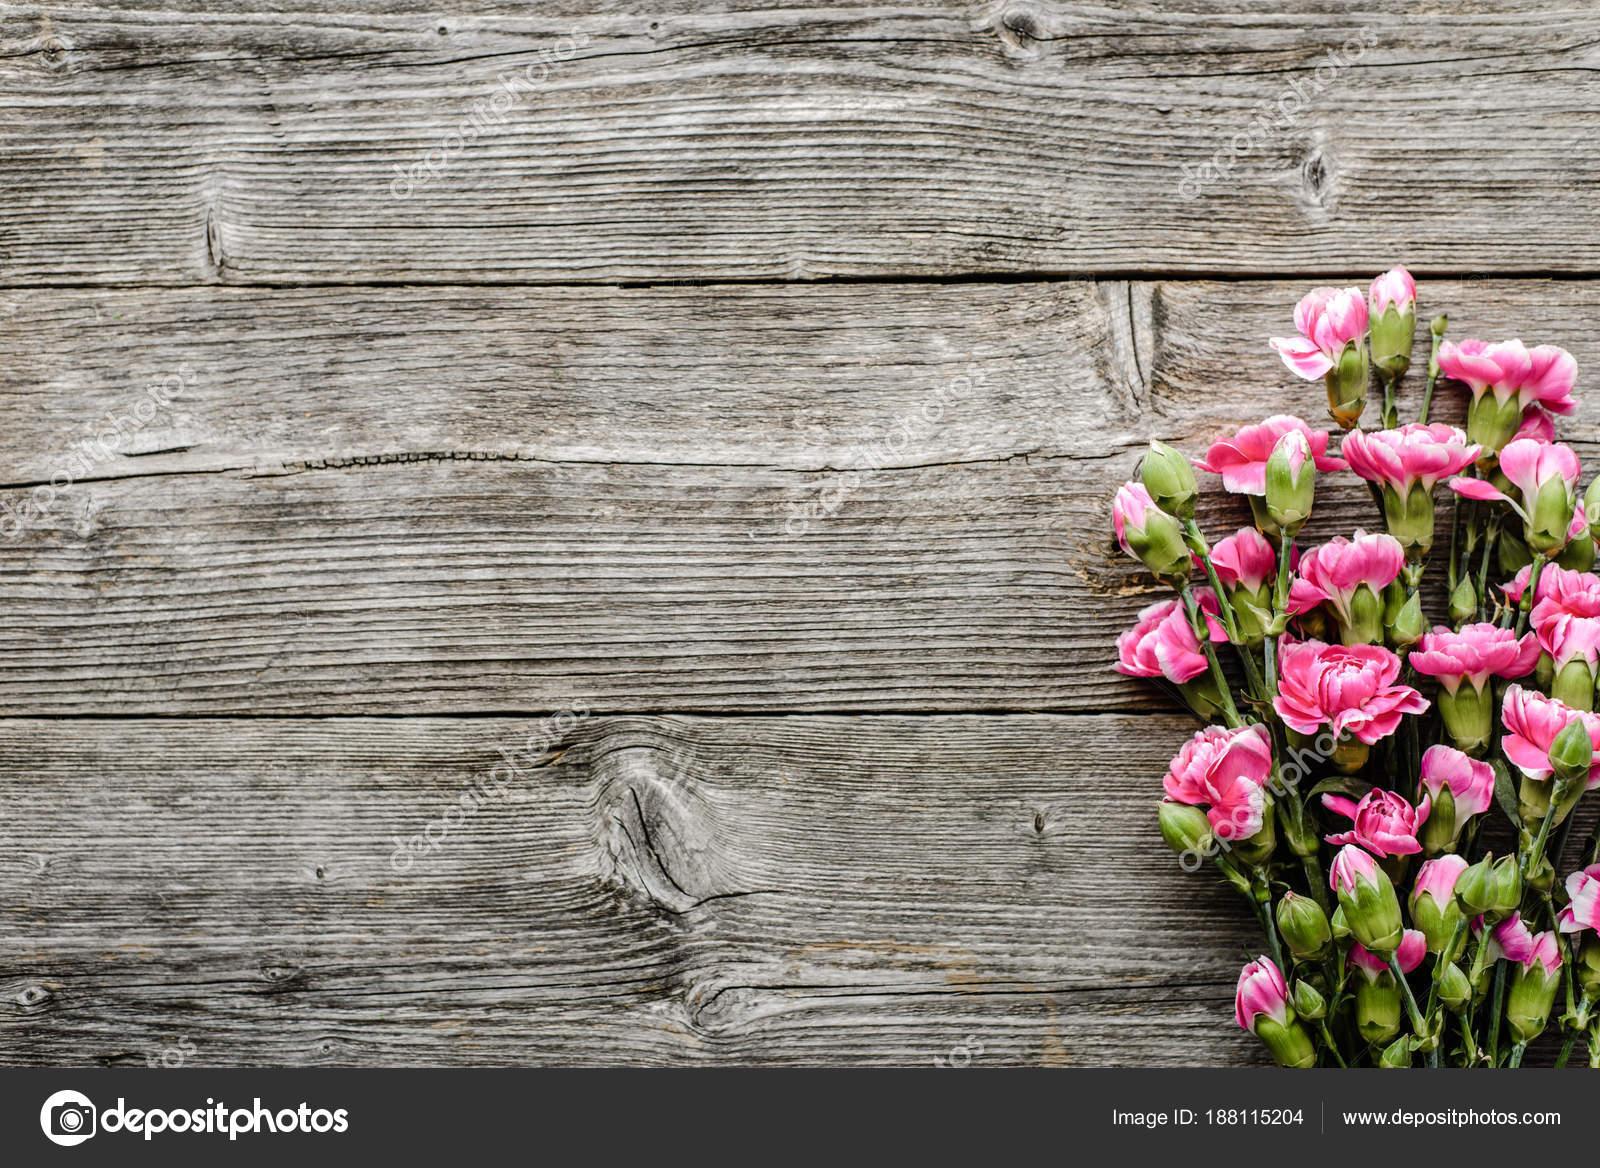 Fondos De Pantalla Rosa Rosa Flores Fondo De Madera: Madera Flores Fondo T